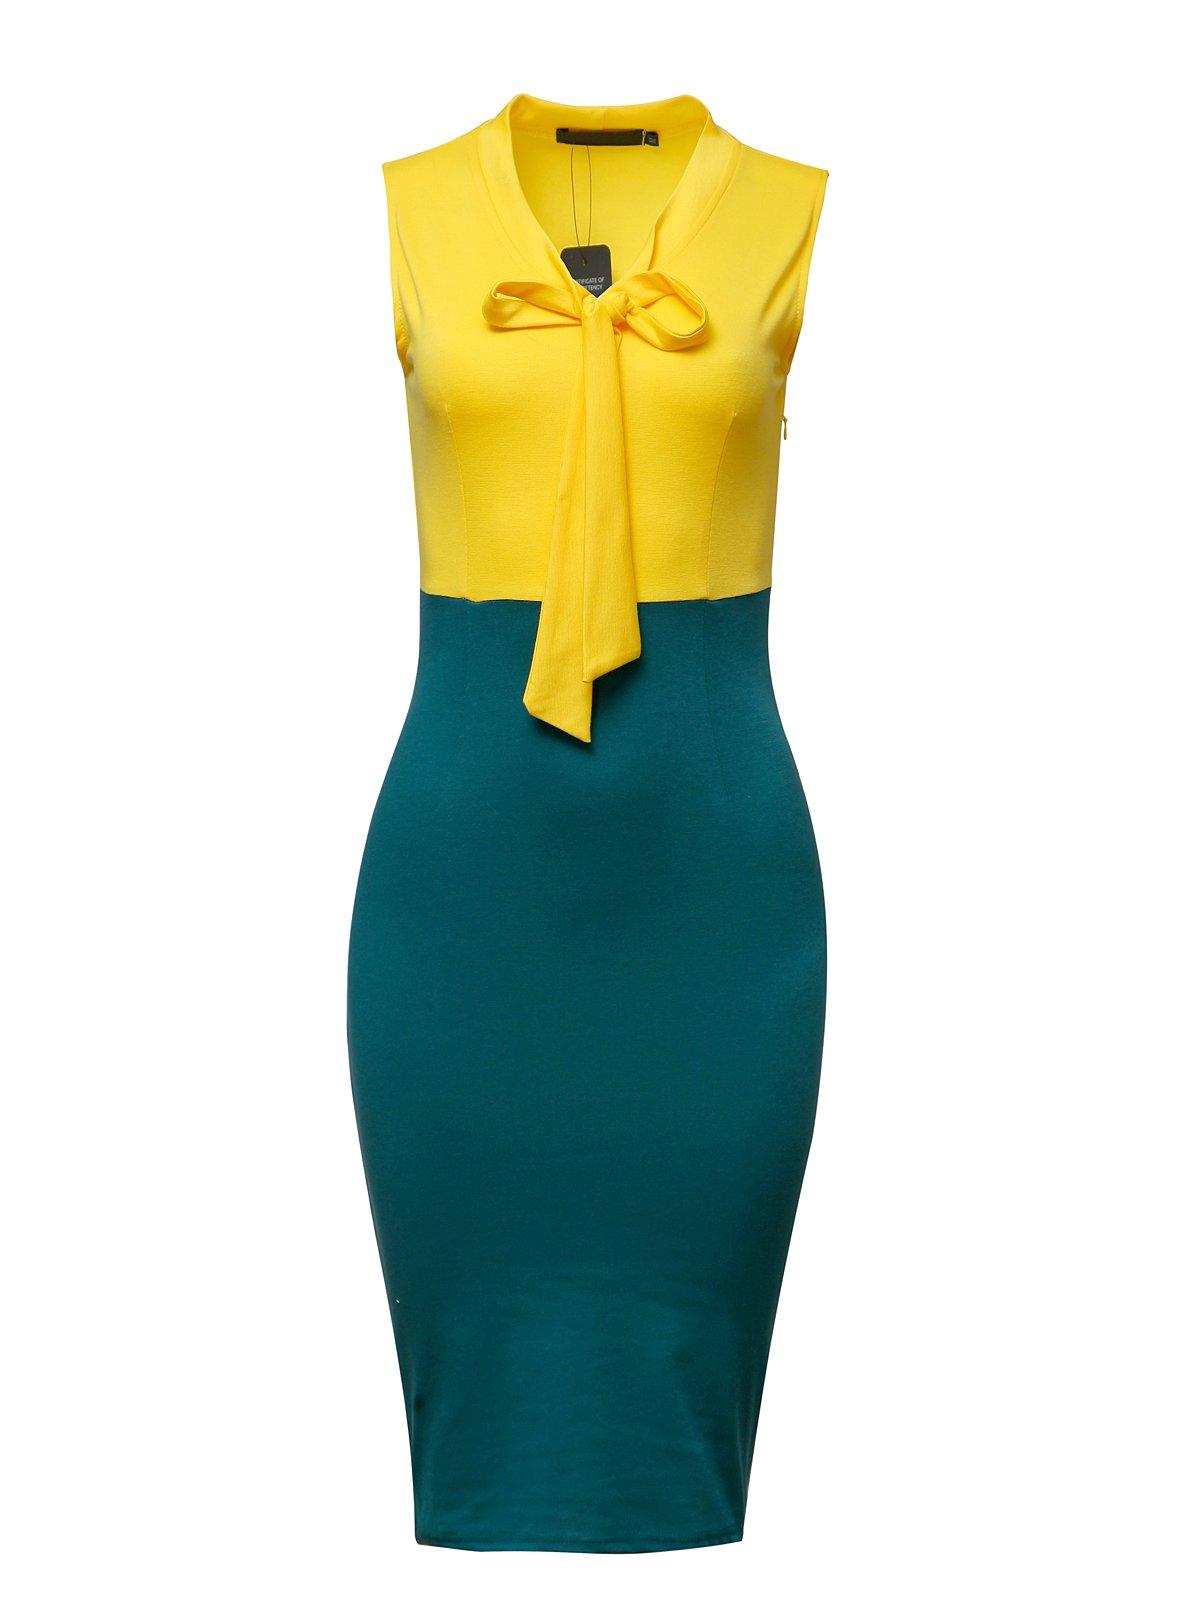 CISMARK Chic Bowknot Sleeveless Knee Length Business Pencil Dress Yellow XL